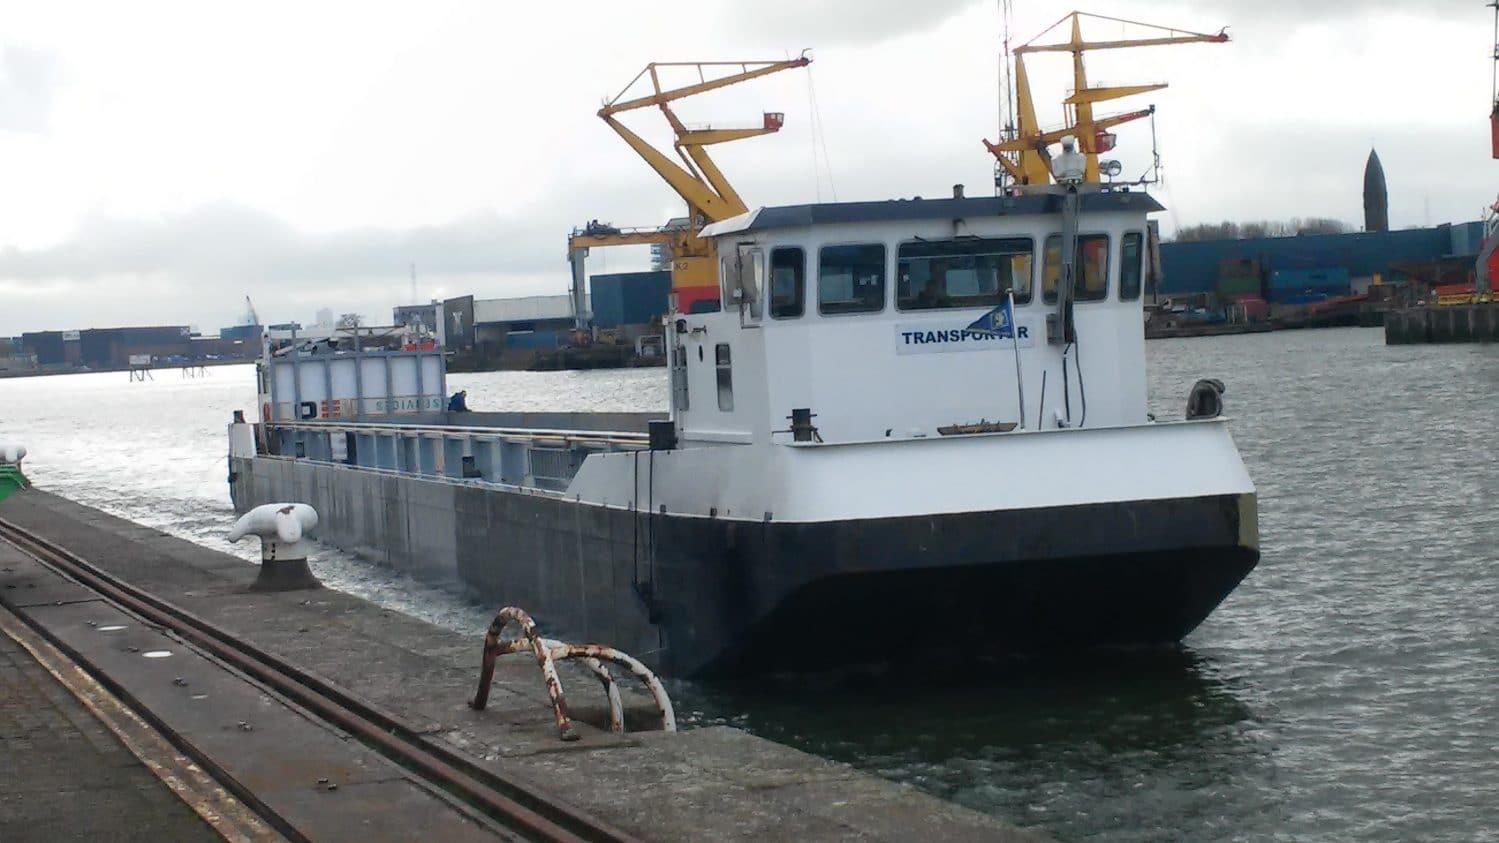 MCS Transporter